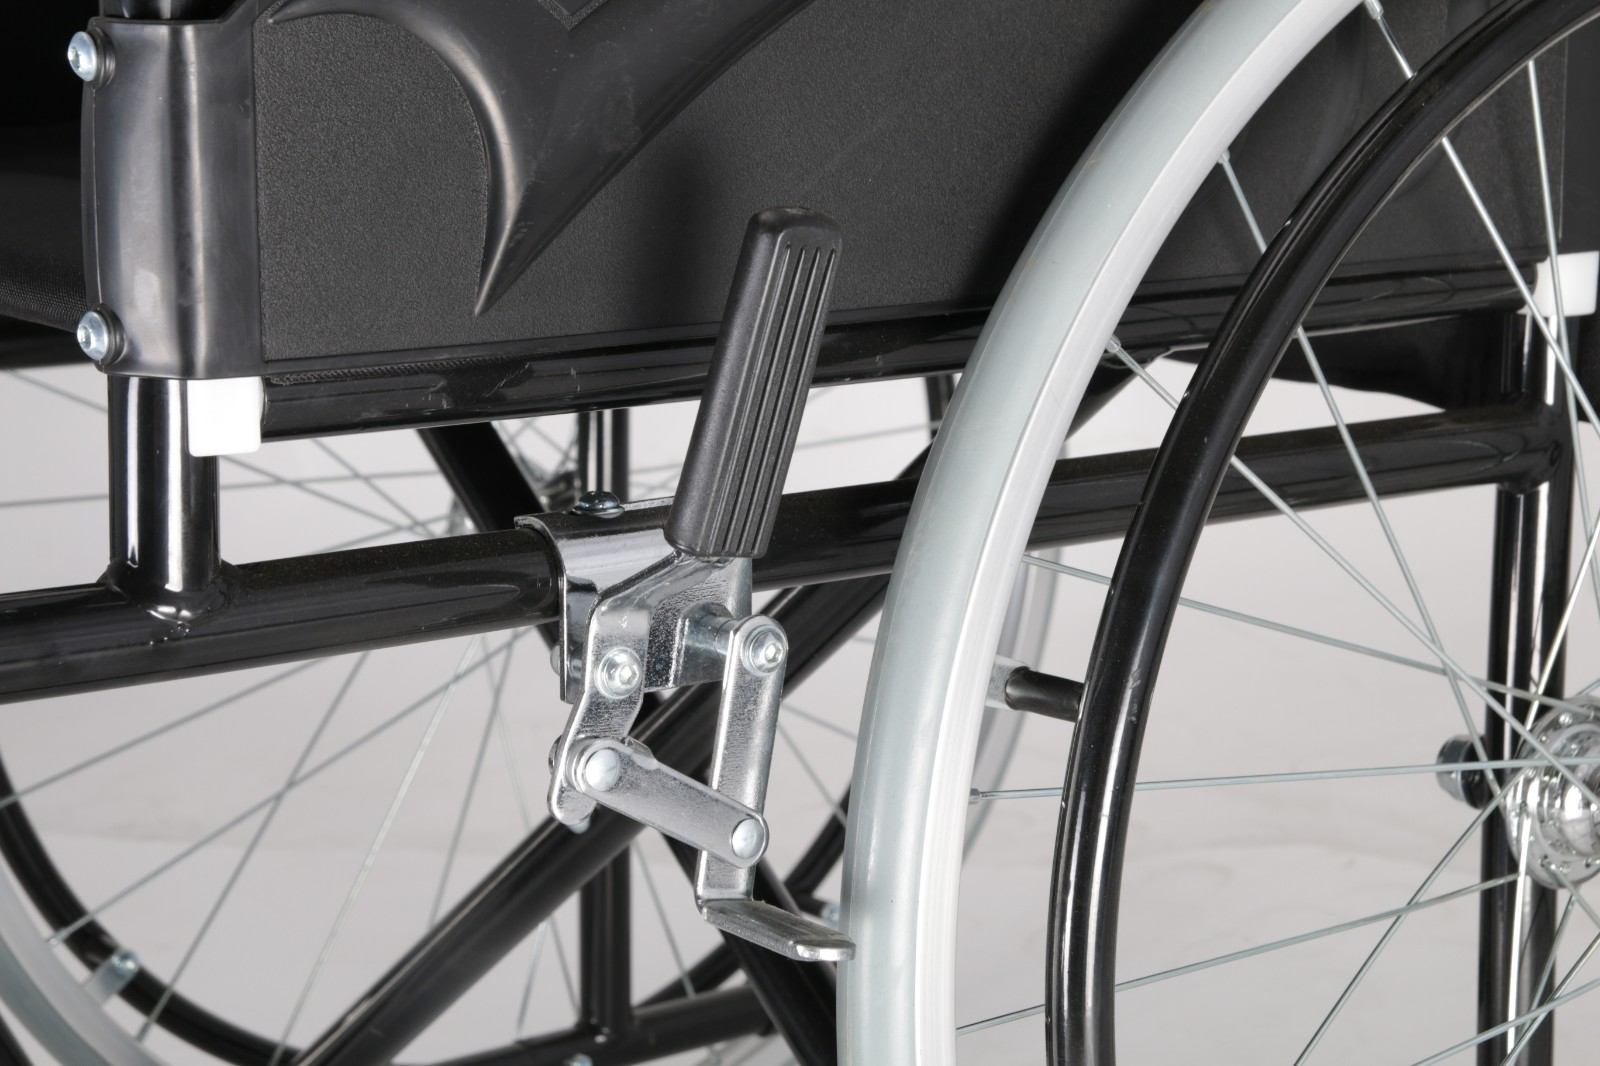 steel manual wheelchair for handicap